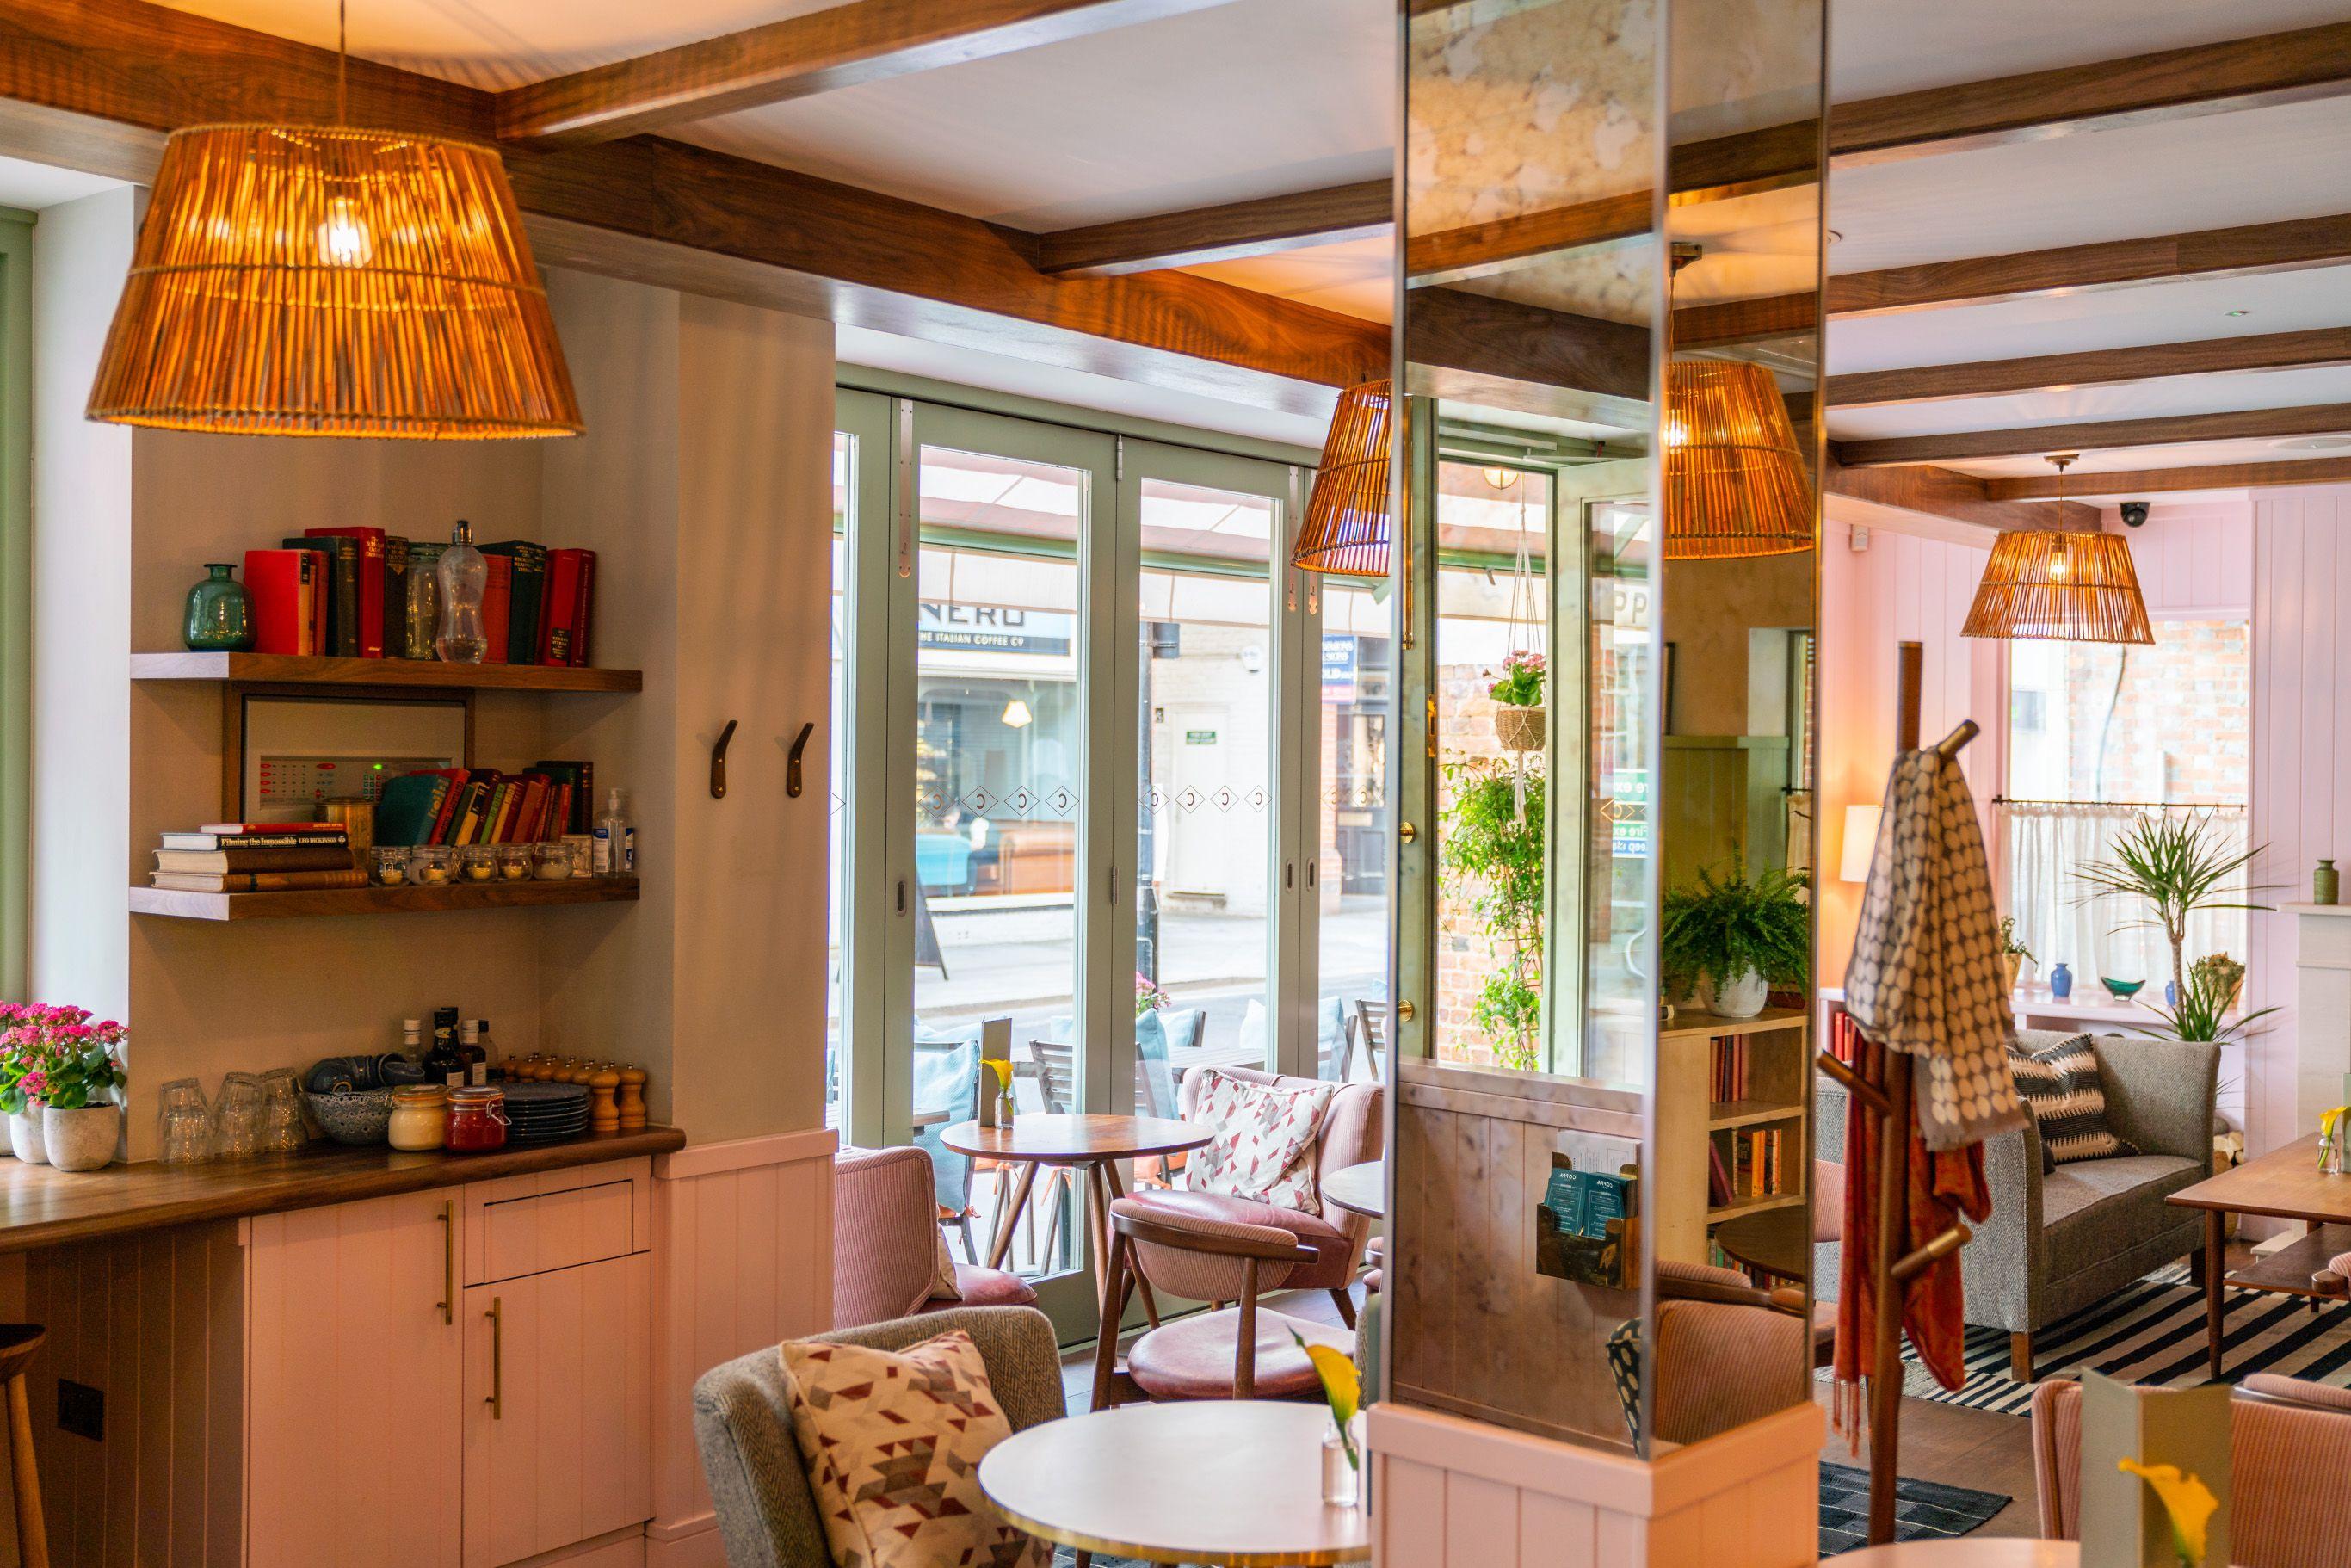 Coppa Club, Henley - Restaurants, Bars, Design, Restaurant Design, Bar